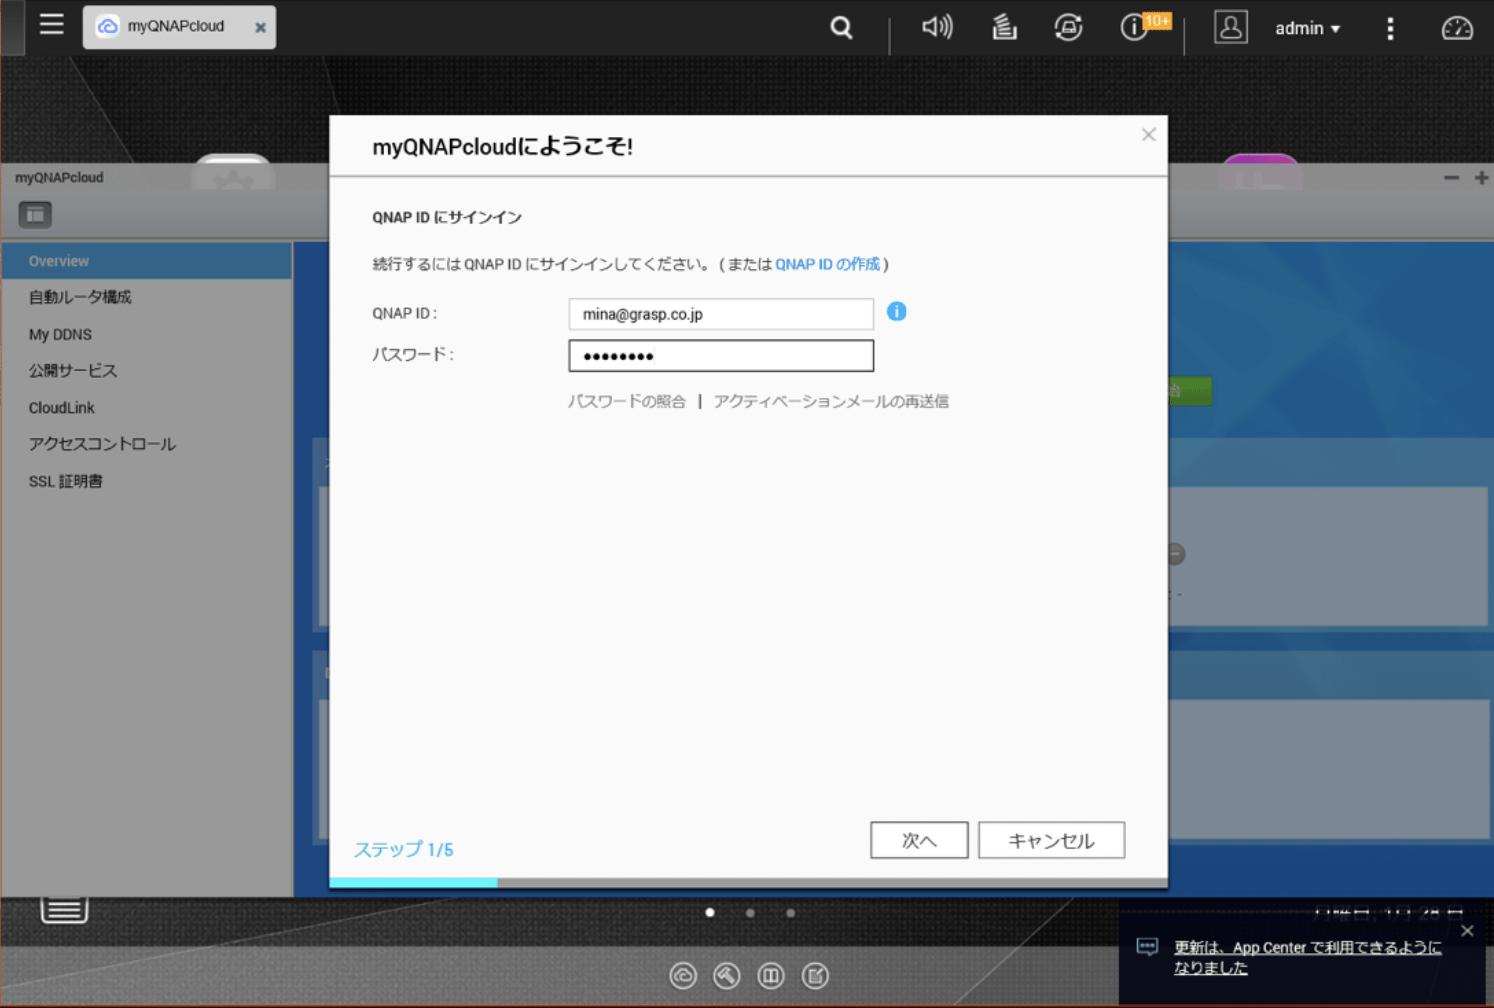 myQNAPcloudを起動してQNAP IDとパスワードを入力